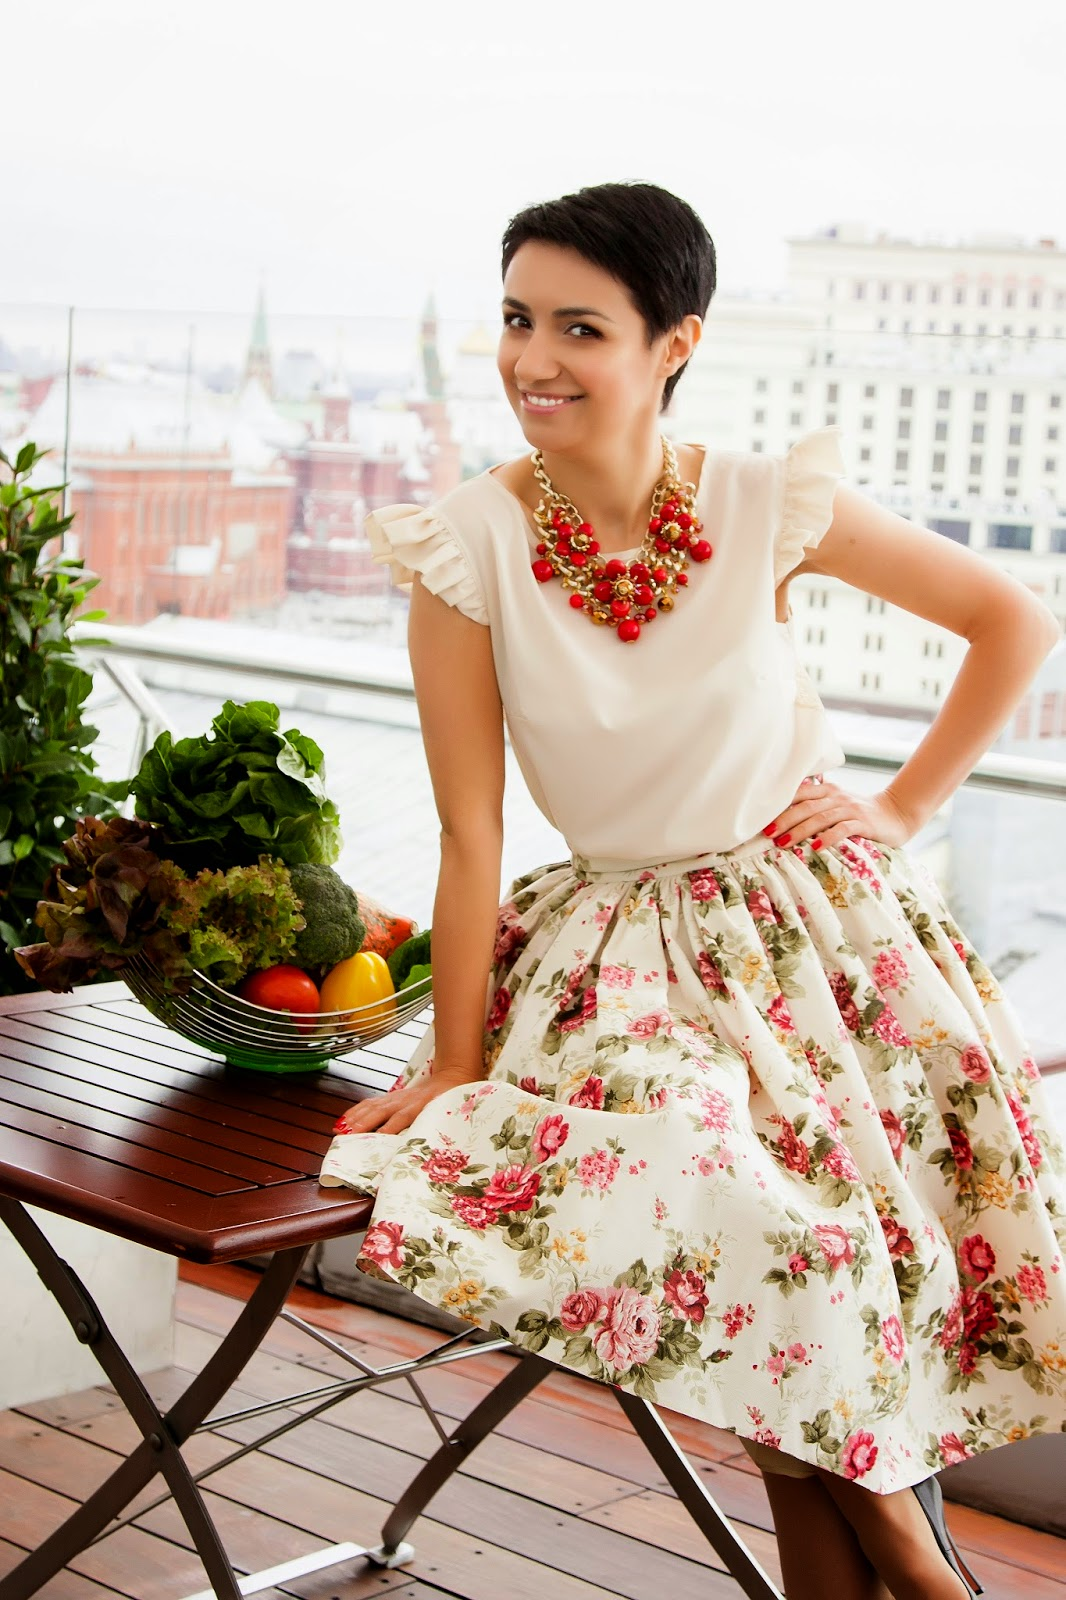 Анна Мелкумян, Anna Melkumian, russian blogger, fashion blogger, российский блогер, фешн блогер, Москва,